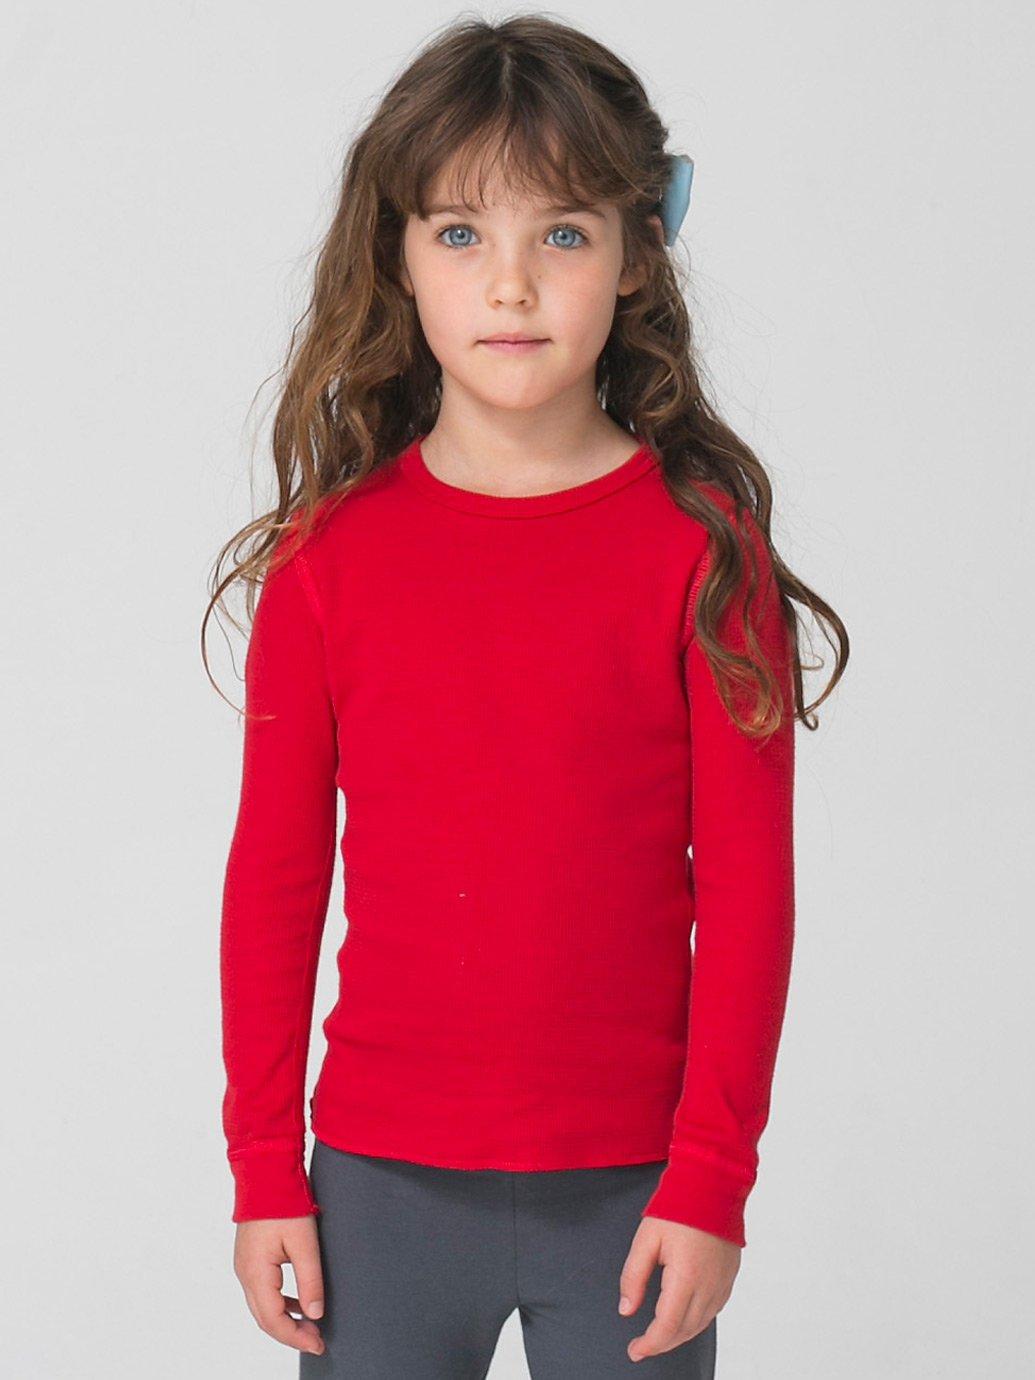 American Apparel Kids Baby Thermal Long Sleeve T-Shirt ...